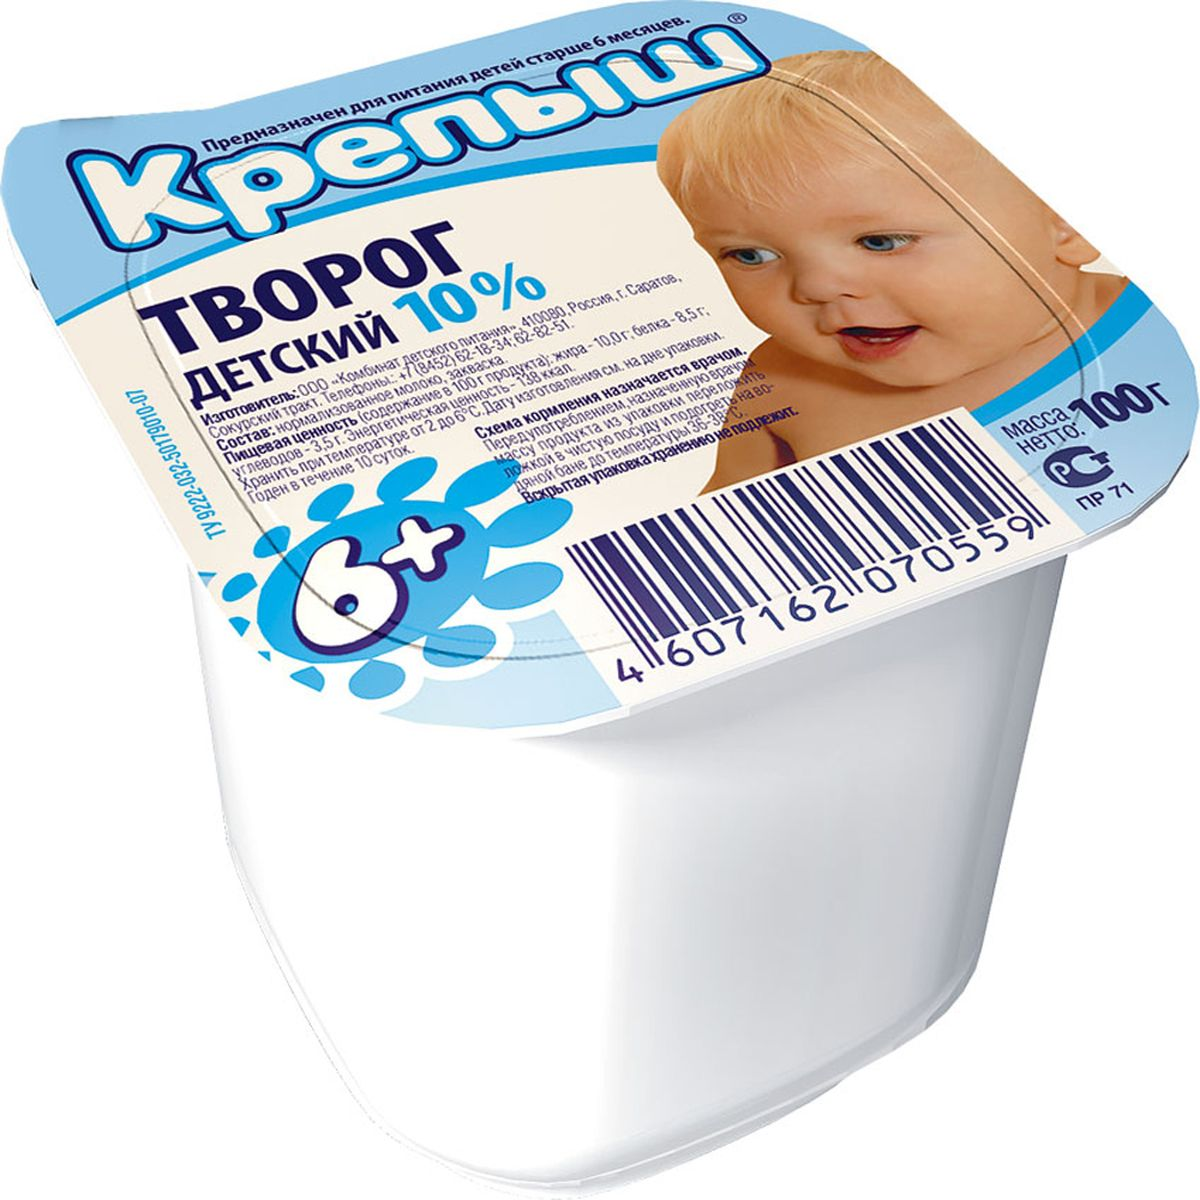 Крепыш Творог детский 10%, 100 г кефир крепыш 3 2